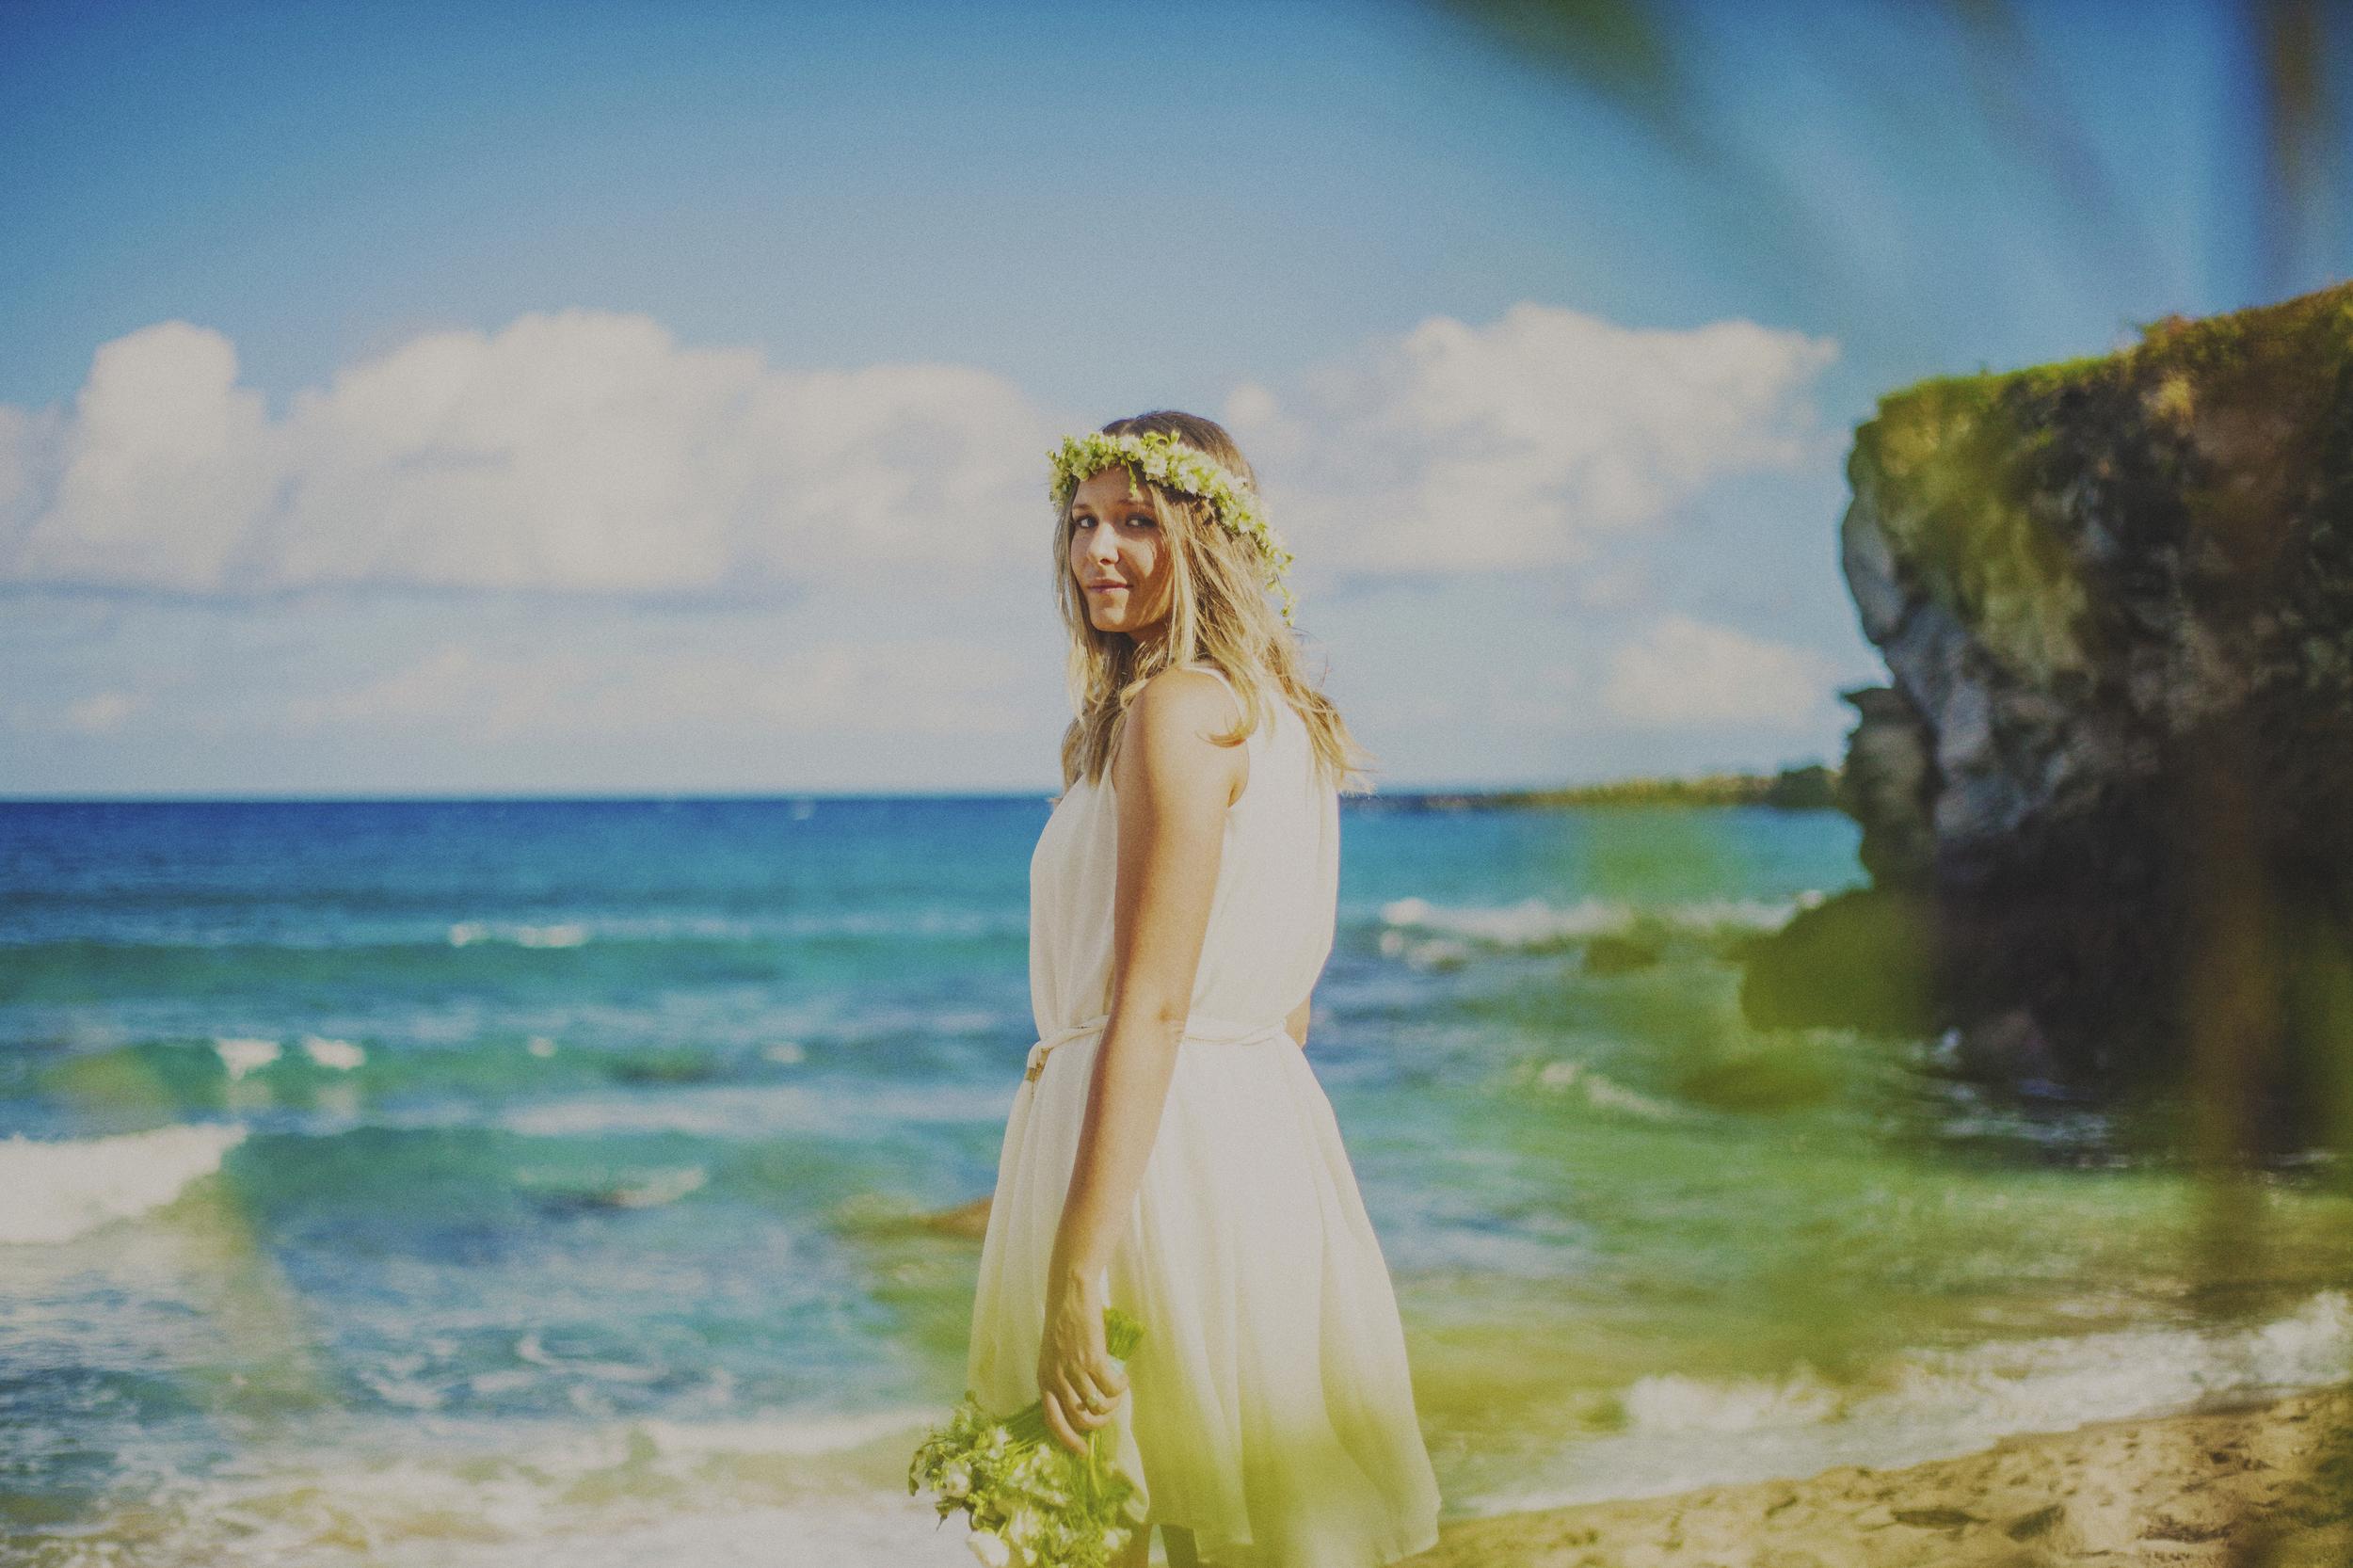 angie-diaz-photography-maui-elopement-oneloa-ironwoods-beach-24.jpg